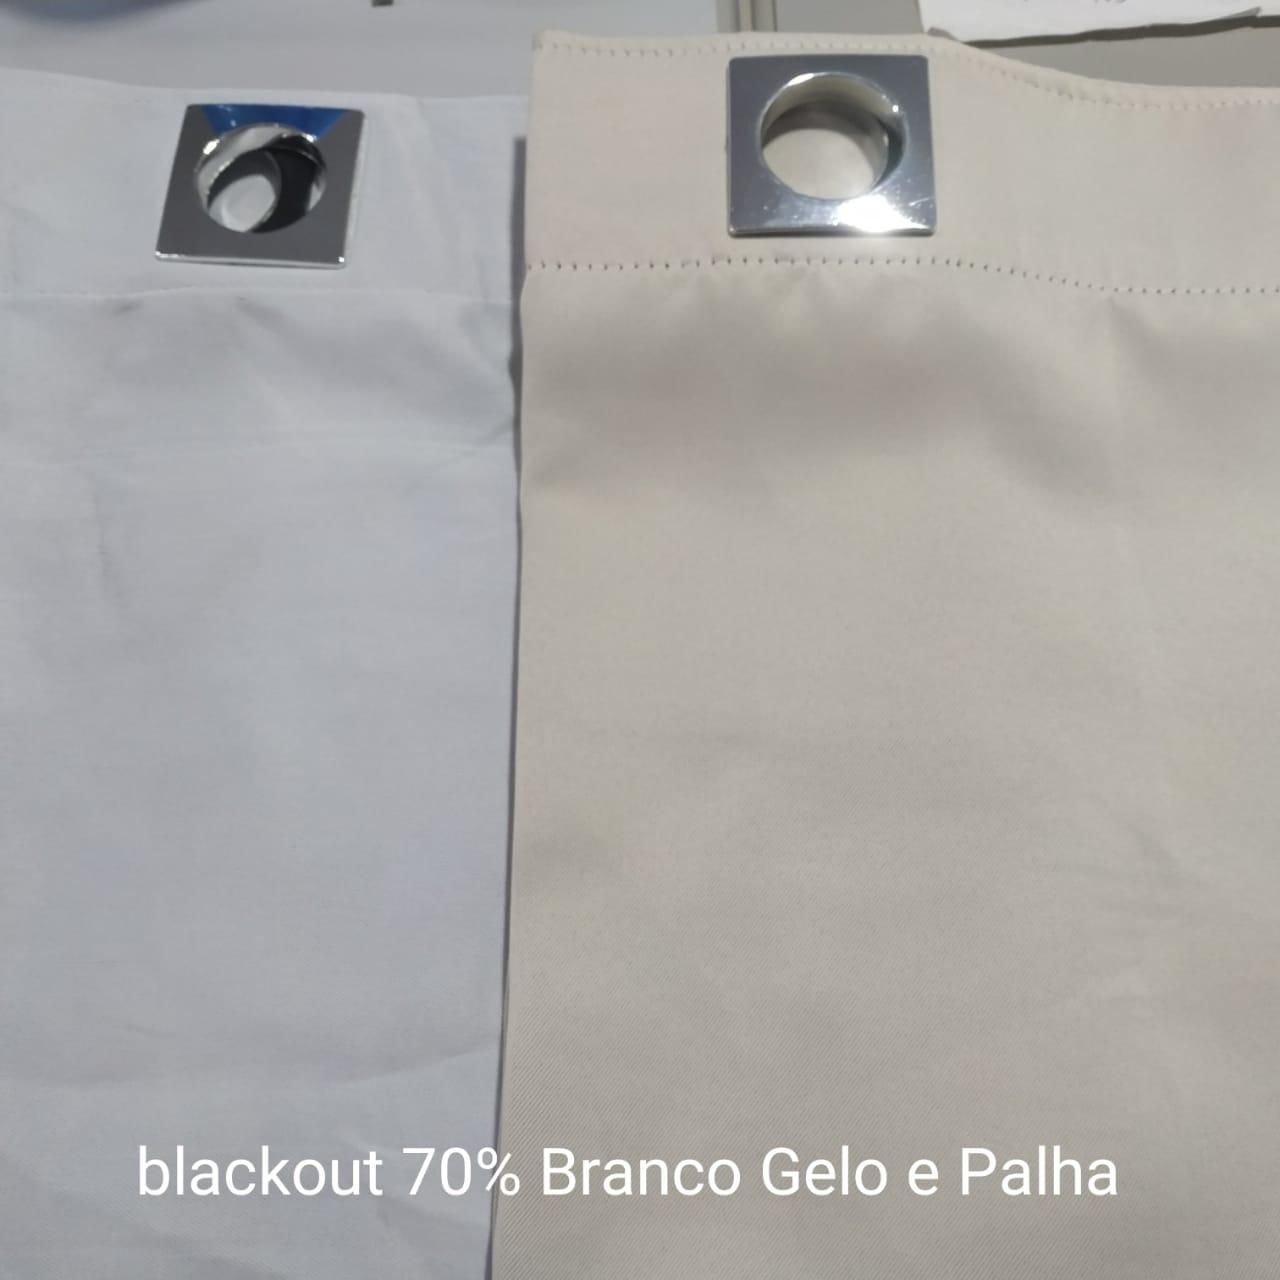 Cortina Voil Liso (azul) com forro Blackout 70% (Bco Gelo) Trilho - 8,10x3,57 F